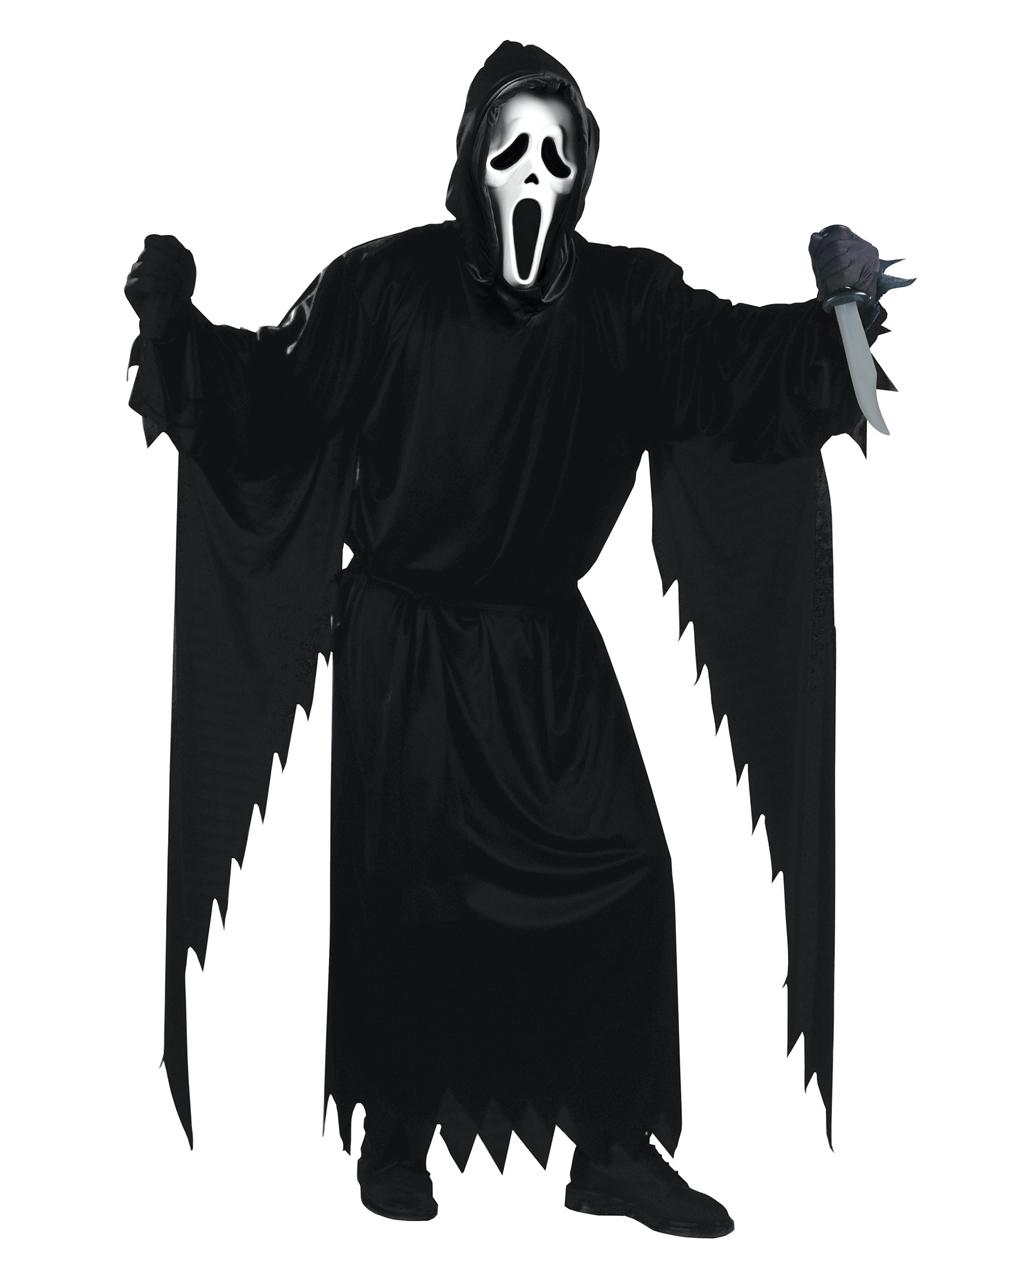 Scream Kostüm Mit Maske Ghost Face Kostüm Horror Shopcom